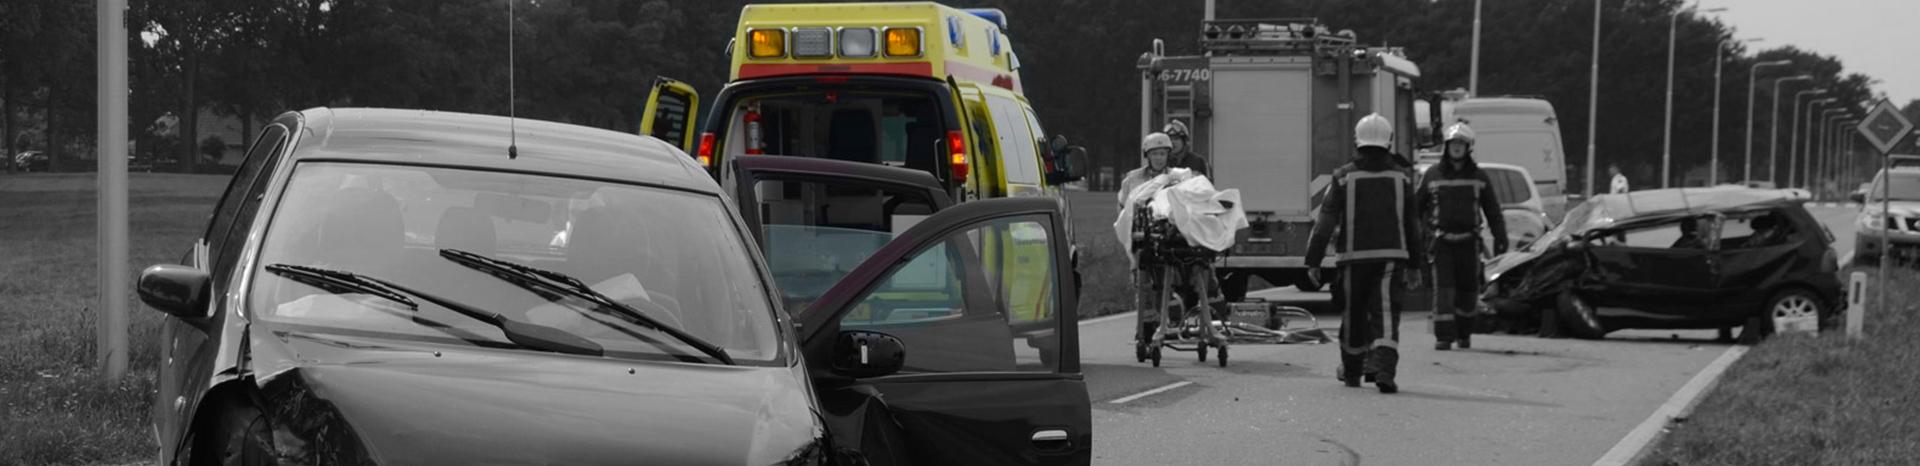 Letselschade auto ongeluk | LetselPro